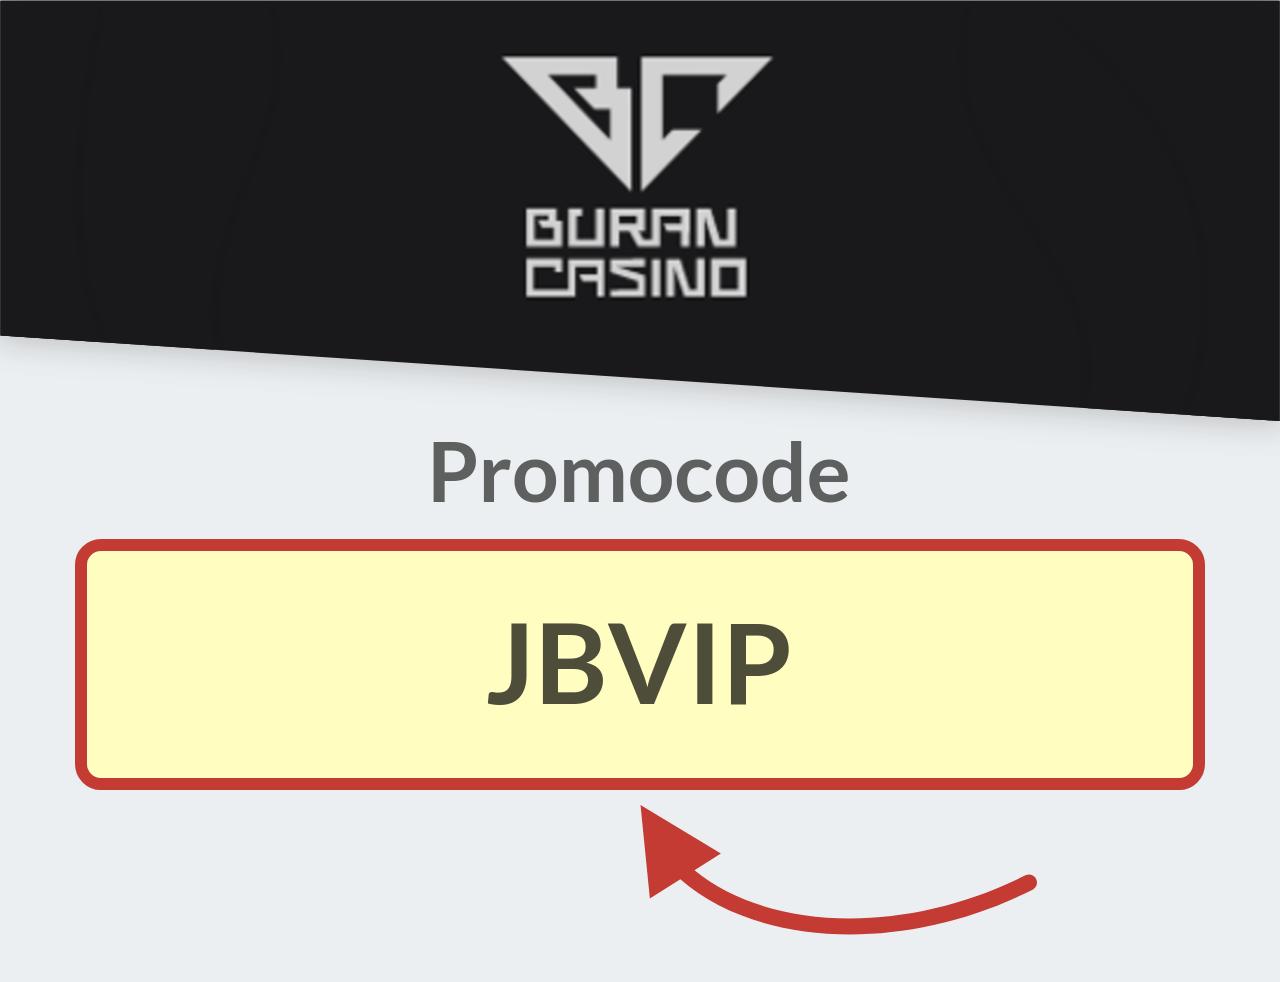 Buran Casino Promo Code